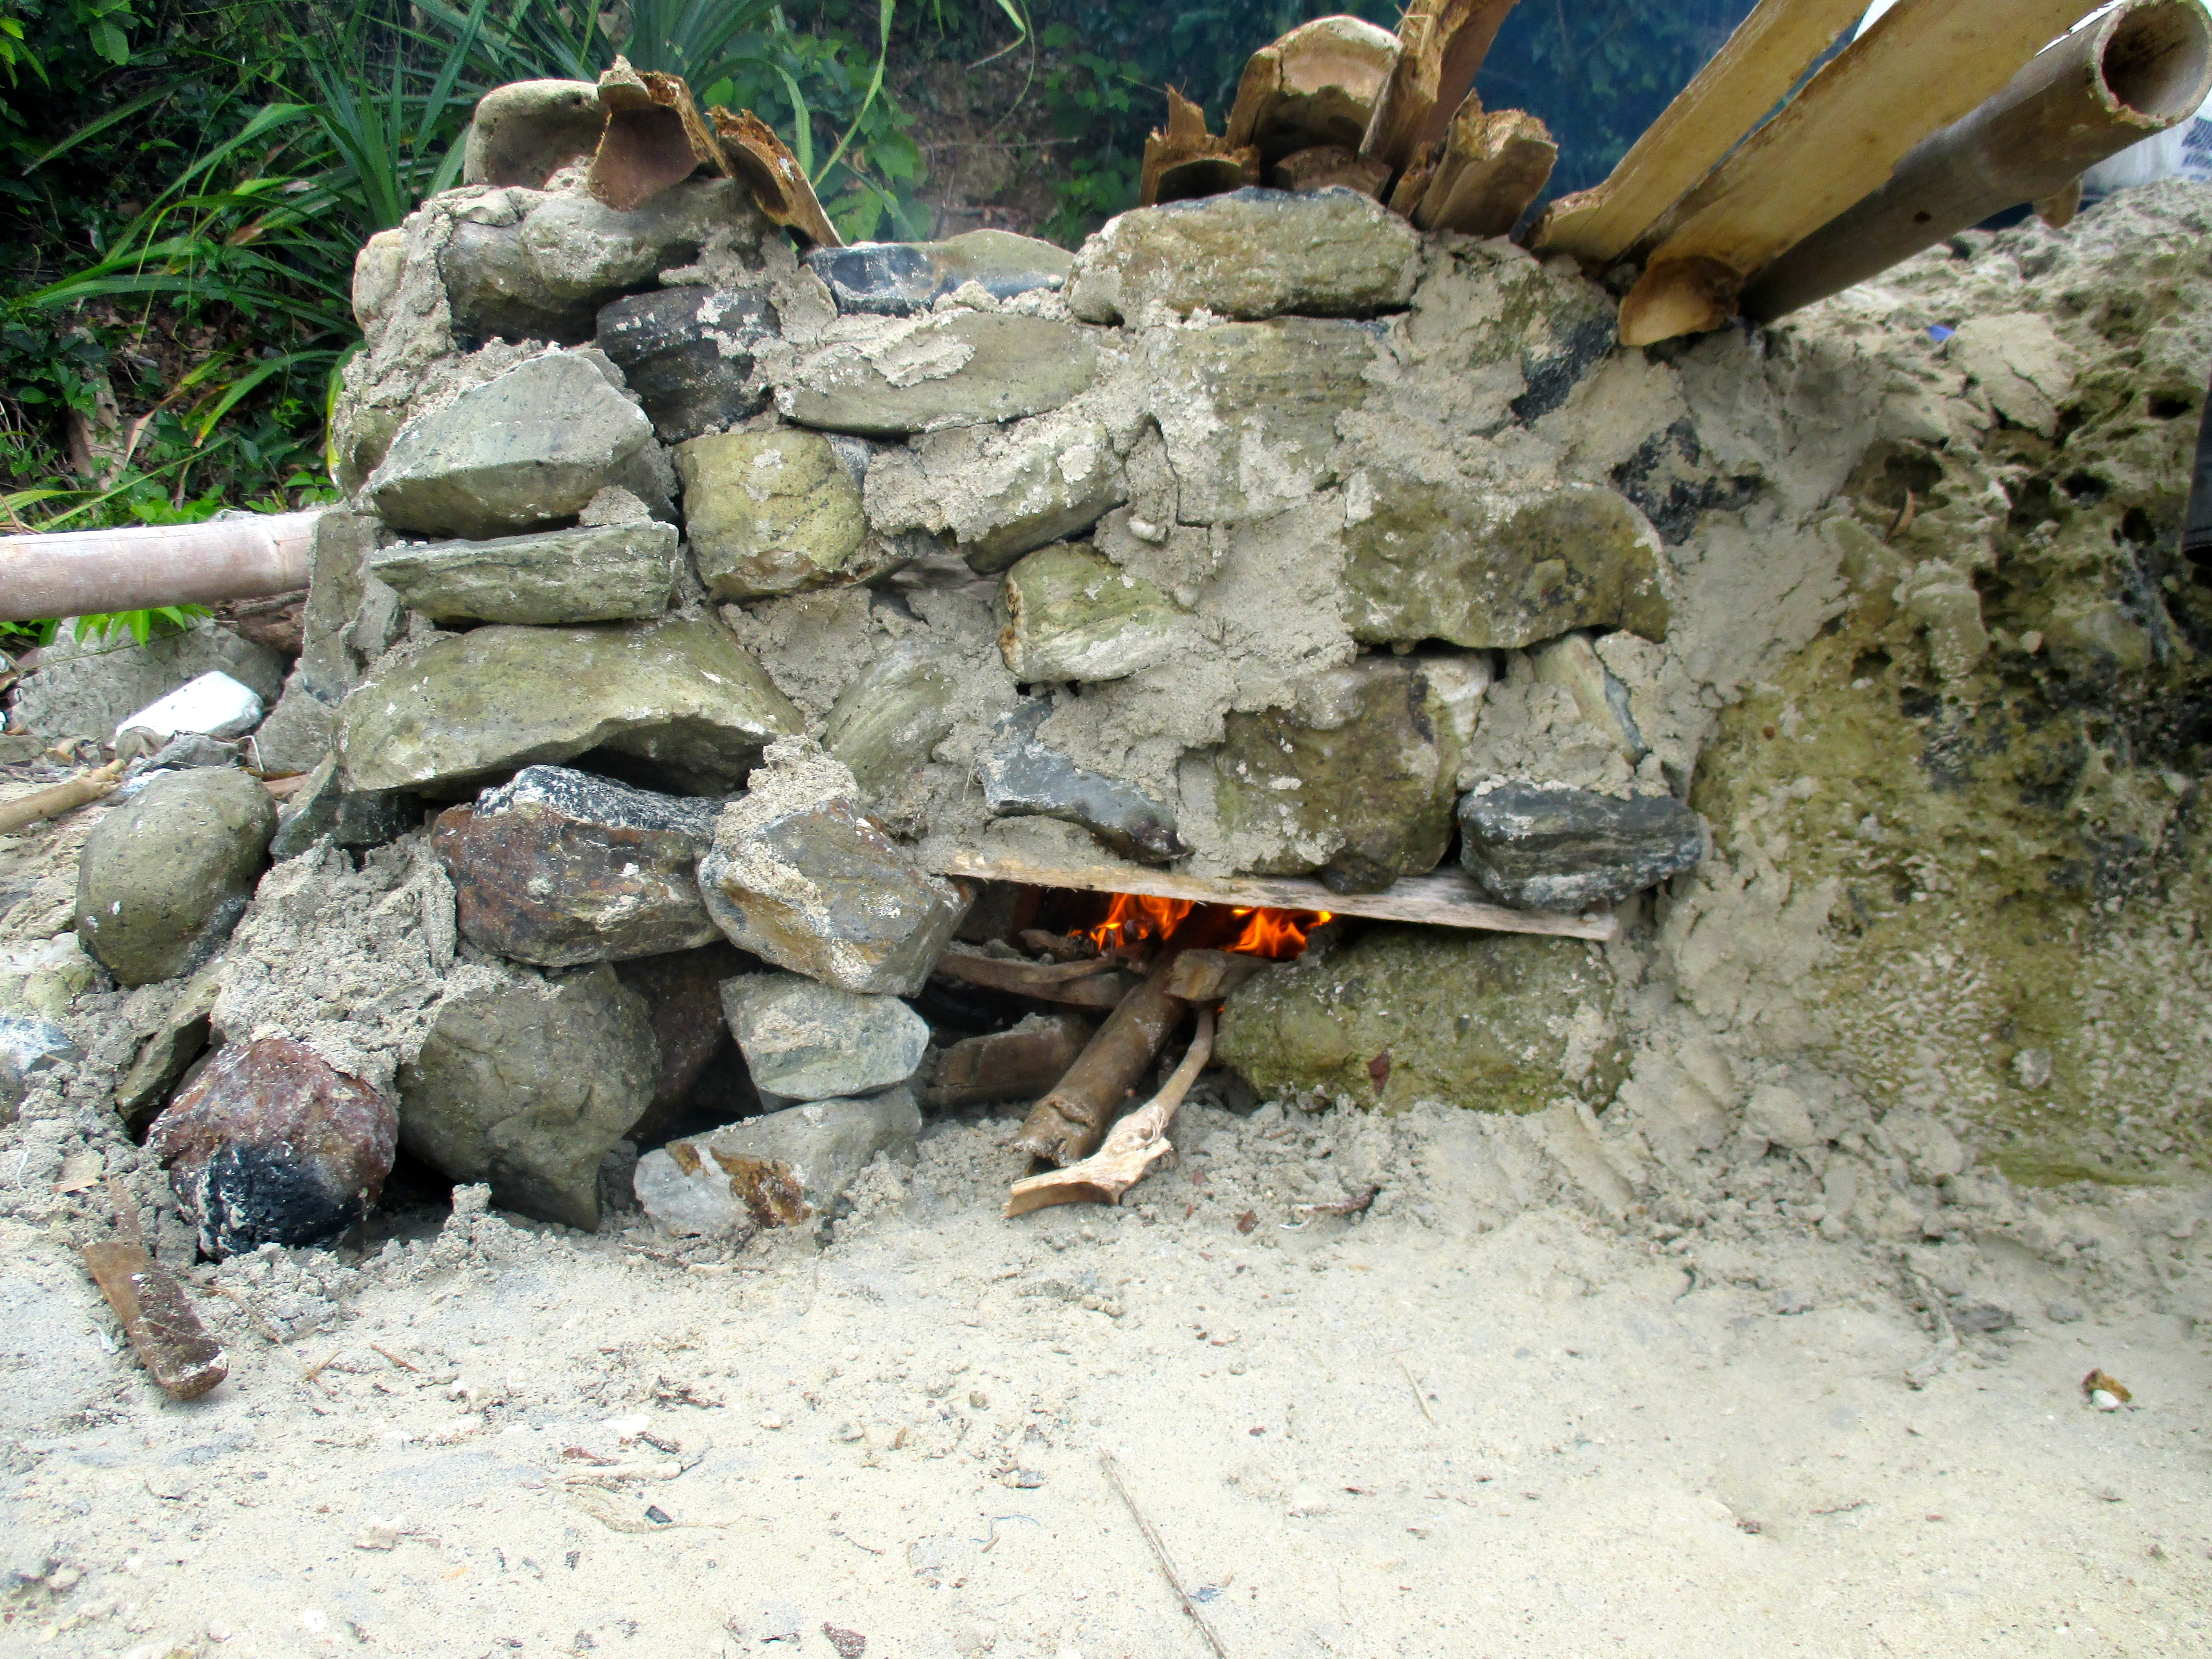 Feeding the beach oven bamboo